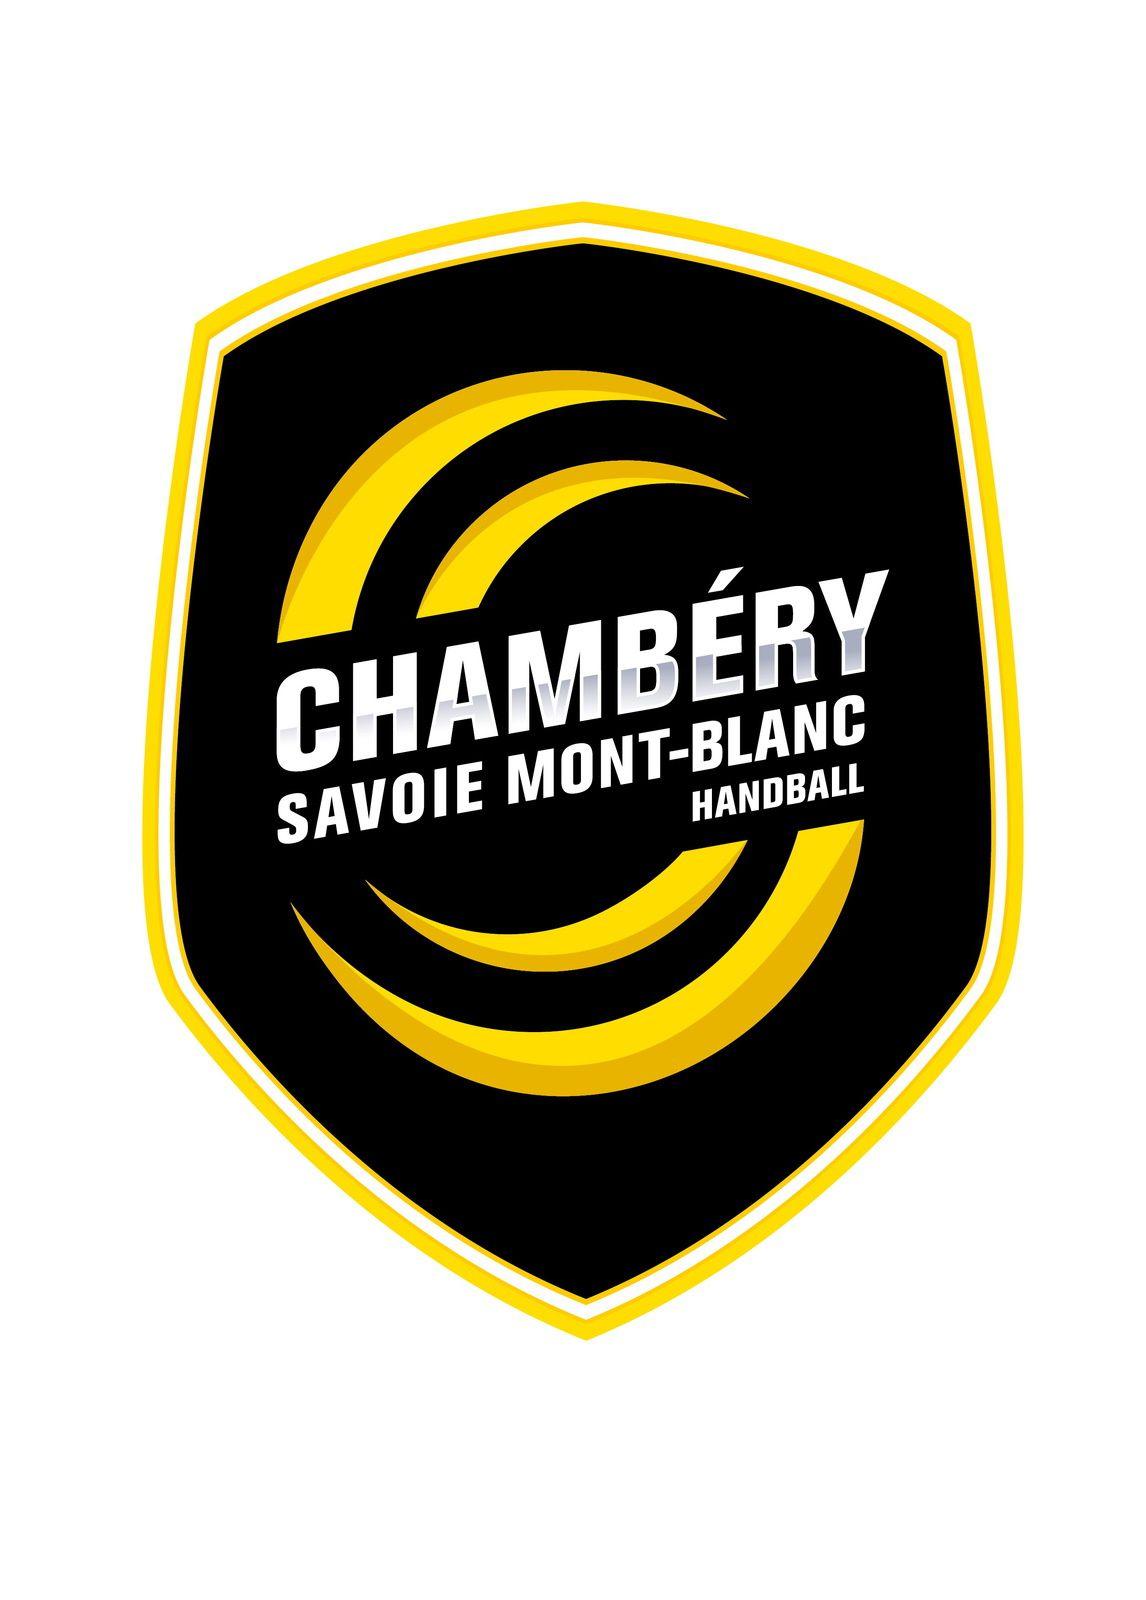 Savoie Mont Blanc étend sa marque